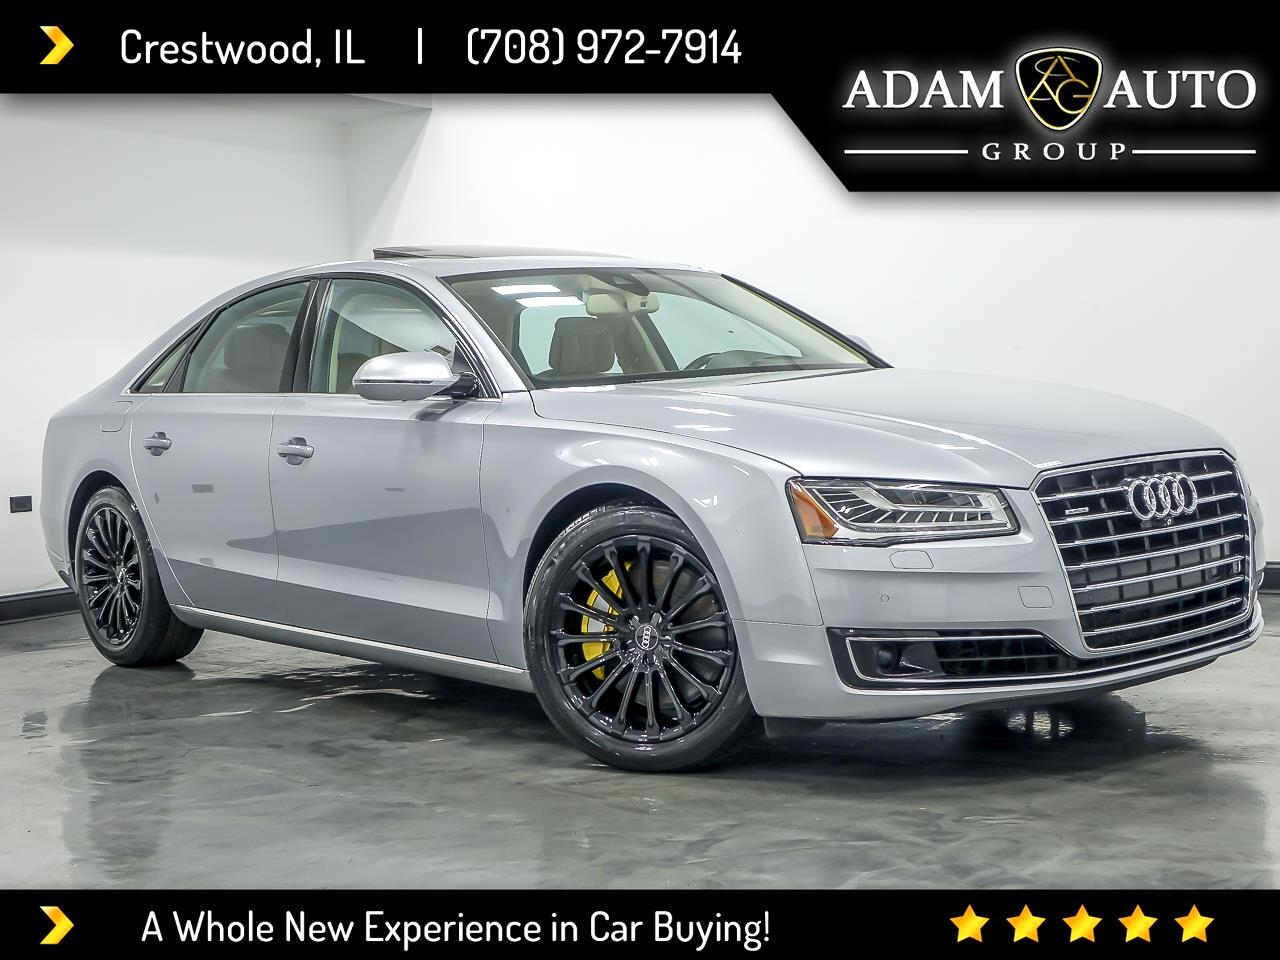 Audi A8 Under 500 Dollars Down